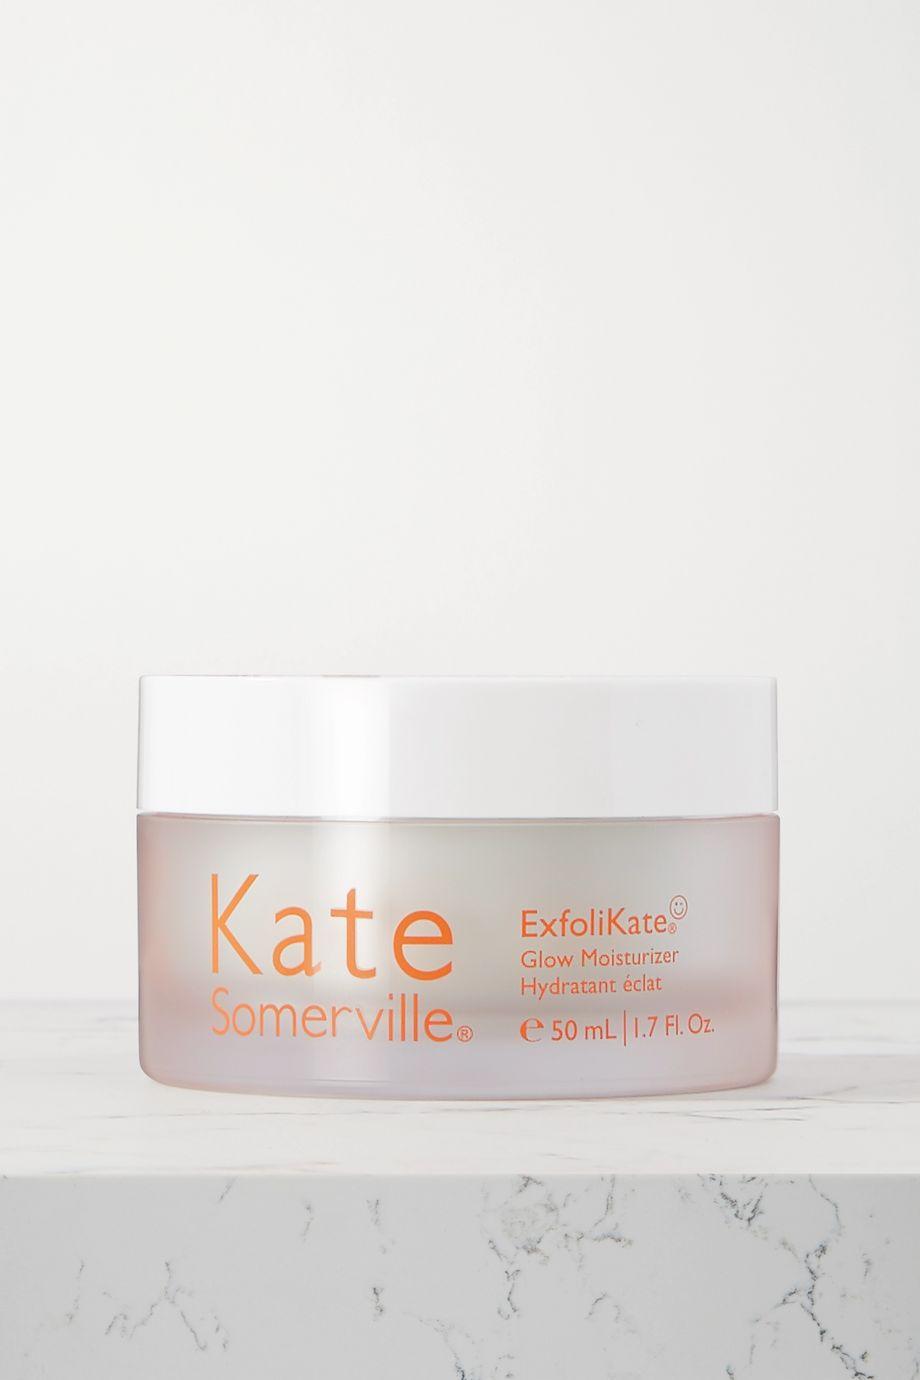 Kate Somerville ExfoliKate Glow Moisturizer, 50ml